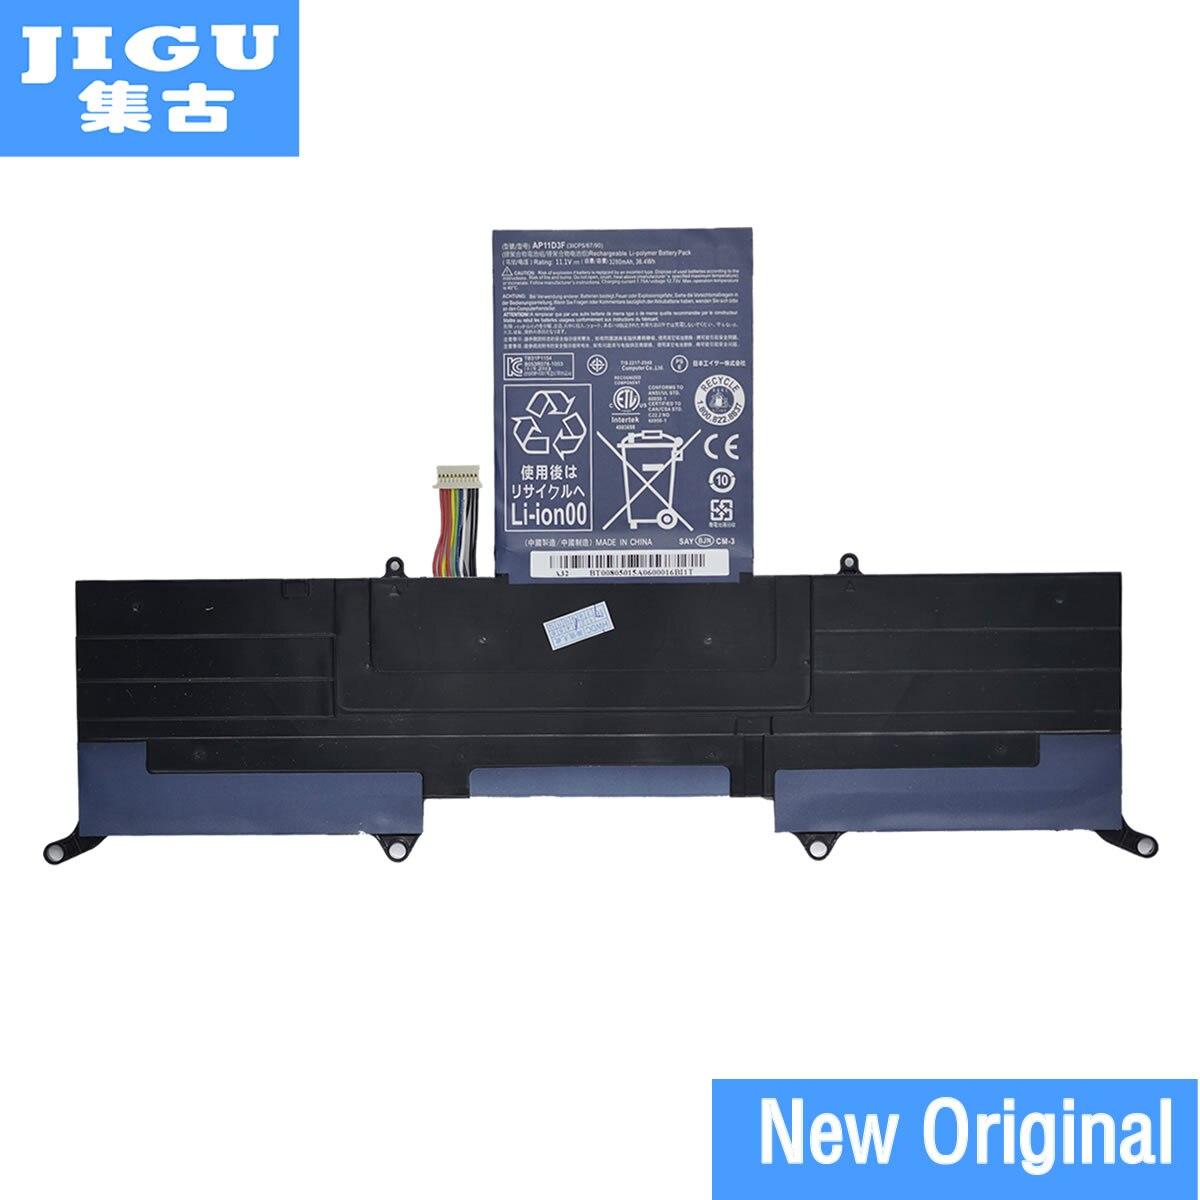 JIGU 3ICP5/65/88 3ICP5/67/90 AP11D3F AP11D4F Original Laptop Battery For ACER Aspire S3 S3-391 S3-951 MS2346